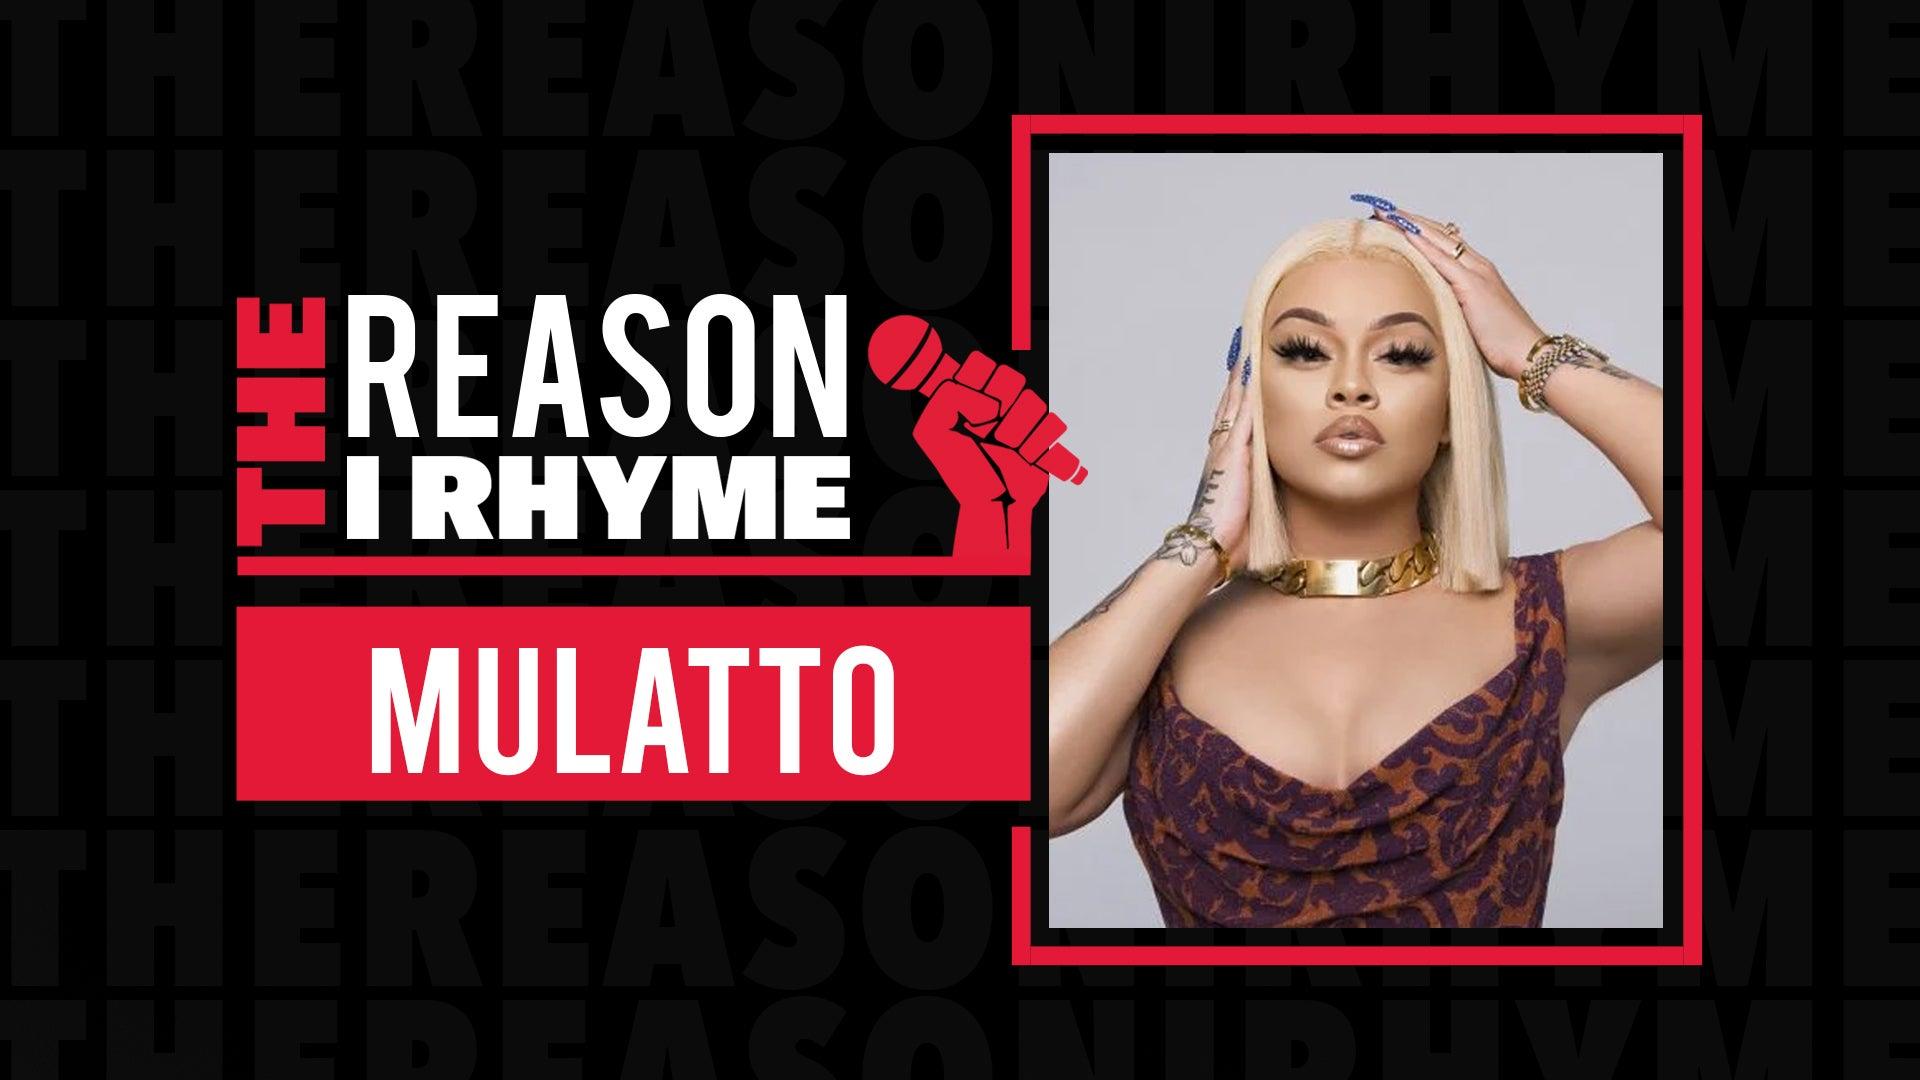 The Reason I Rhyme: Mulatto